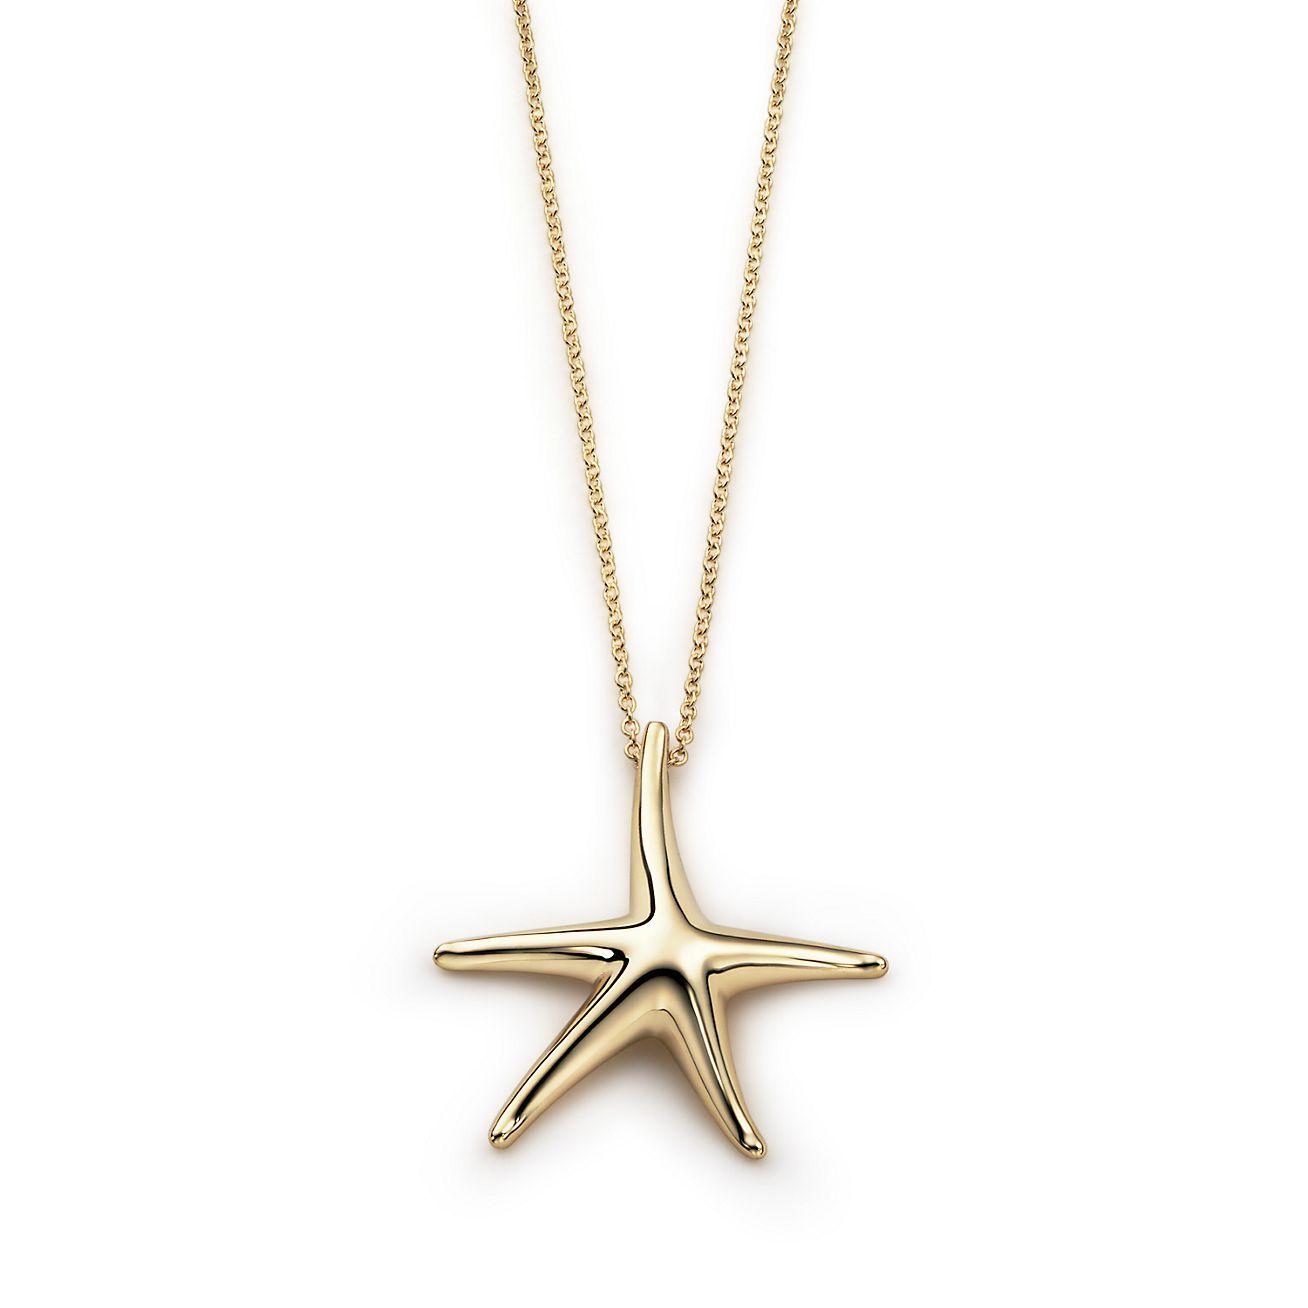 Elsa peretti starfish pendant in 18k gold 28 mm tiffany co elsa perettistarfish pendant aloadofball Choice Image